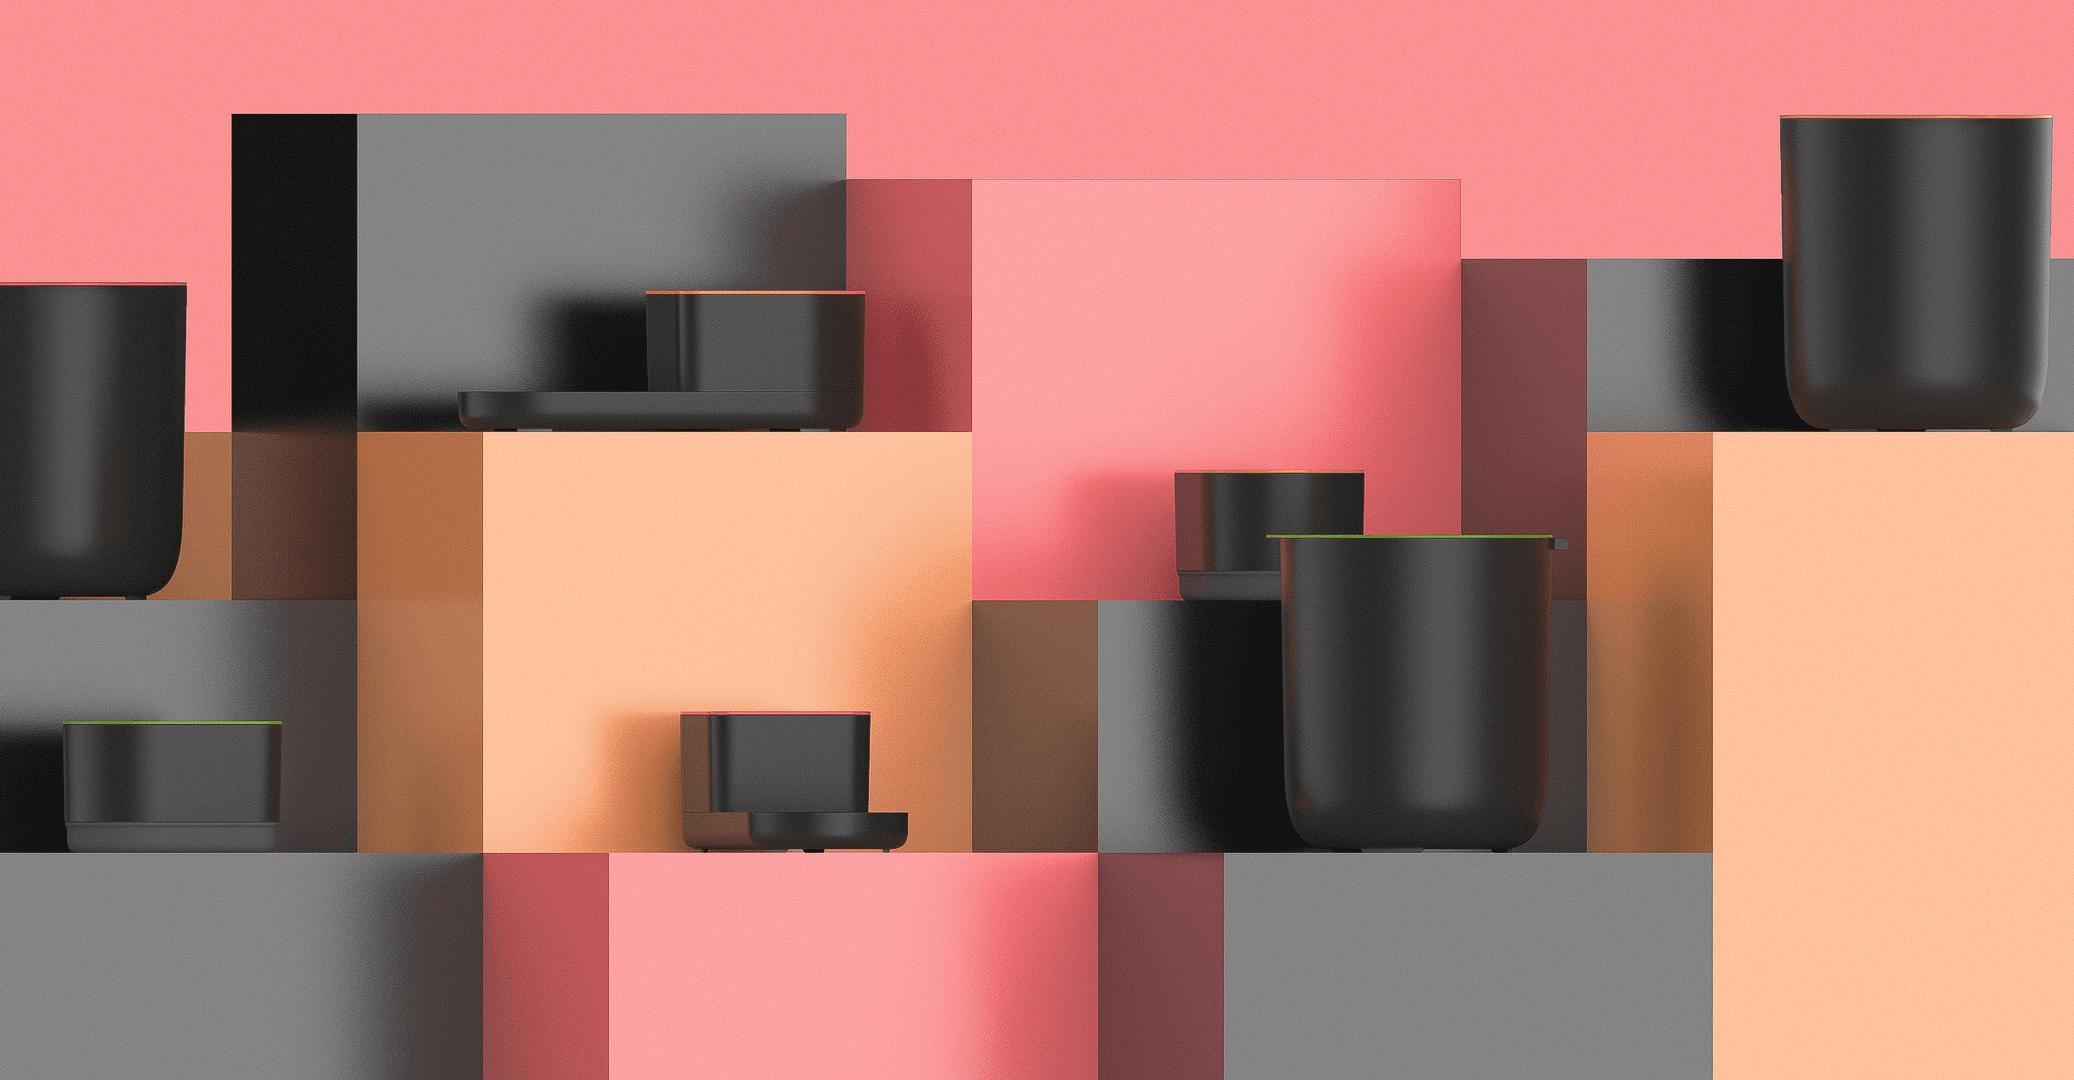 design-de-produto-arthi-valkiria-012